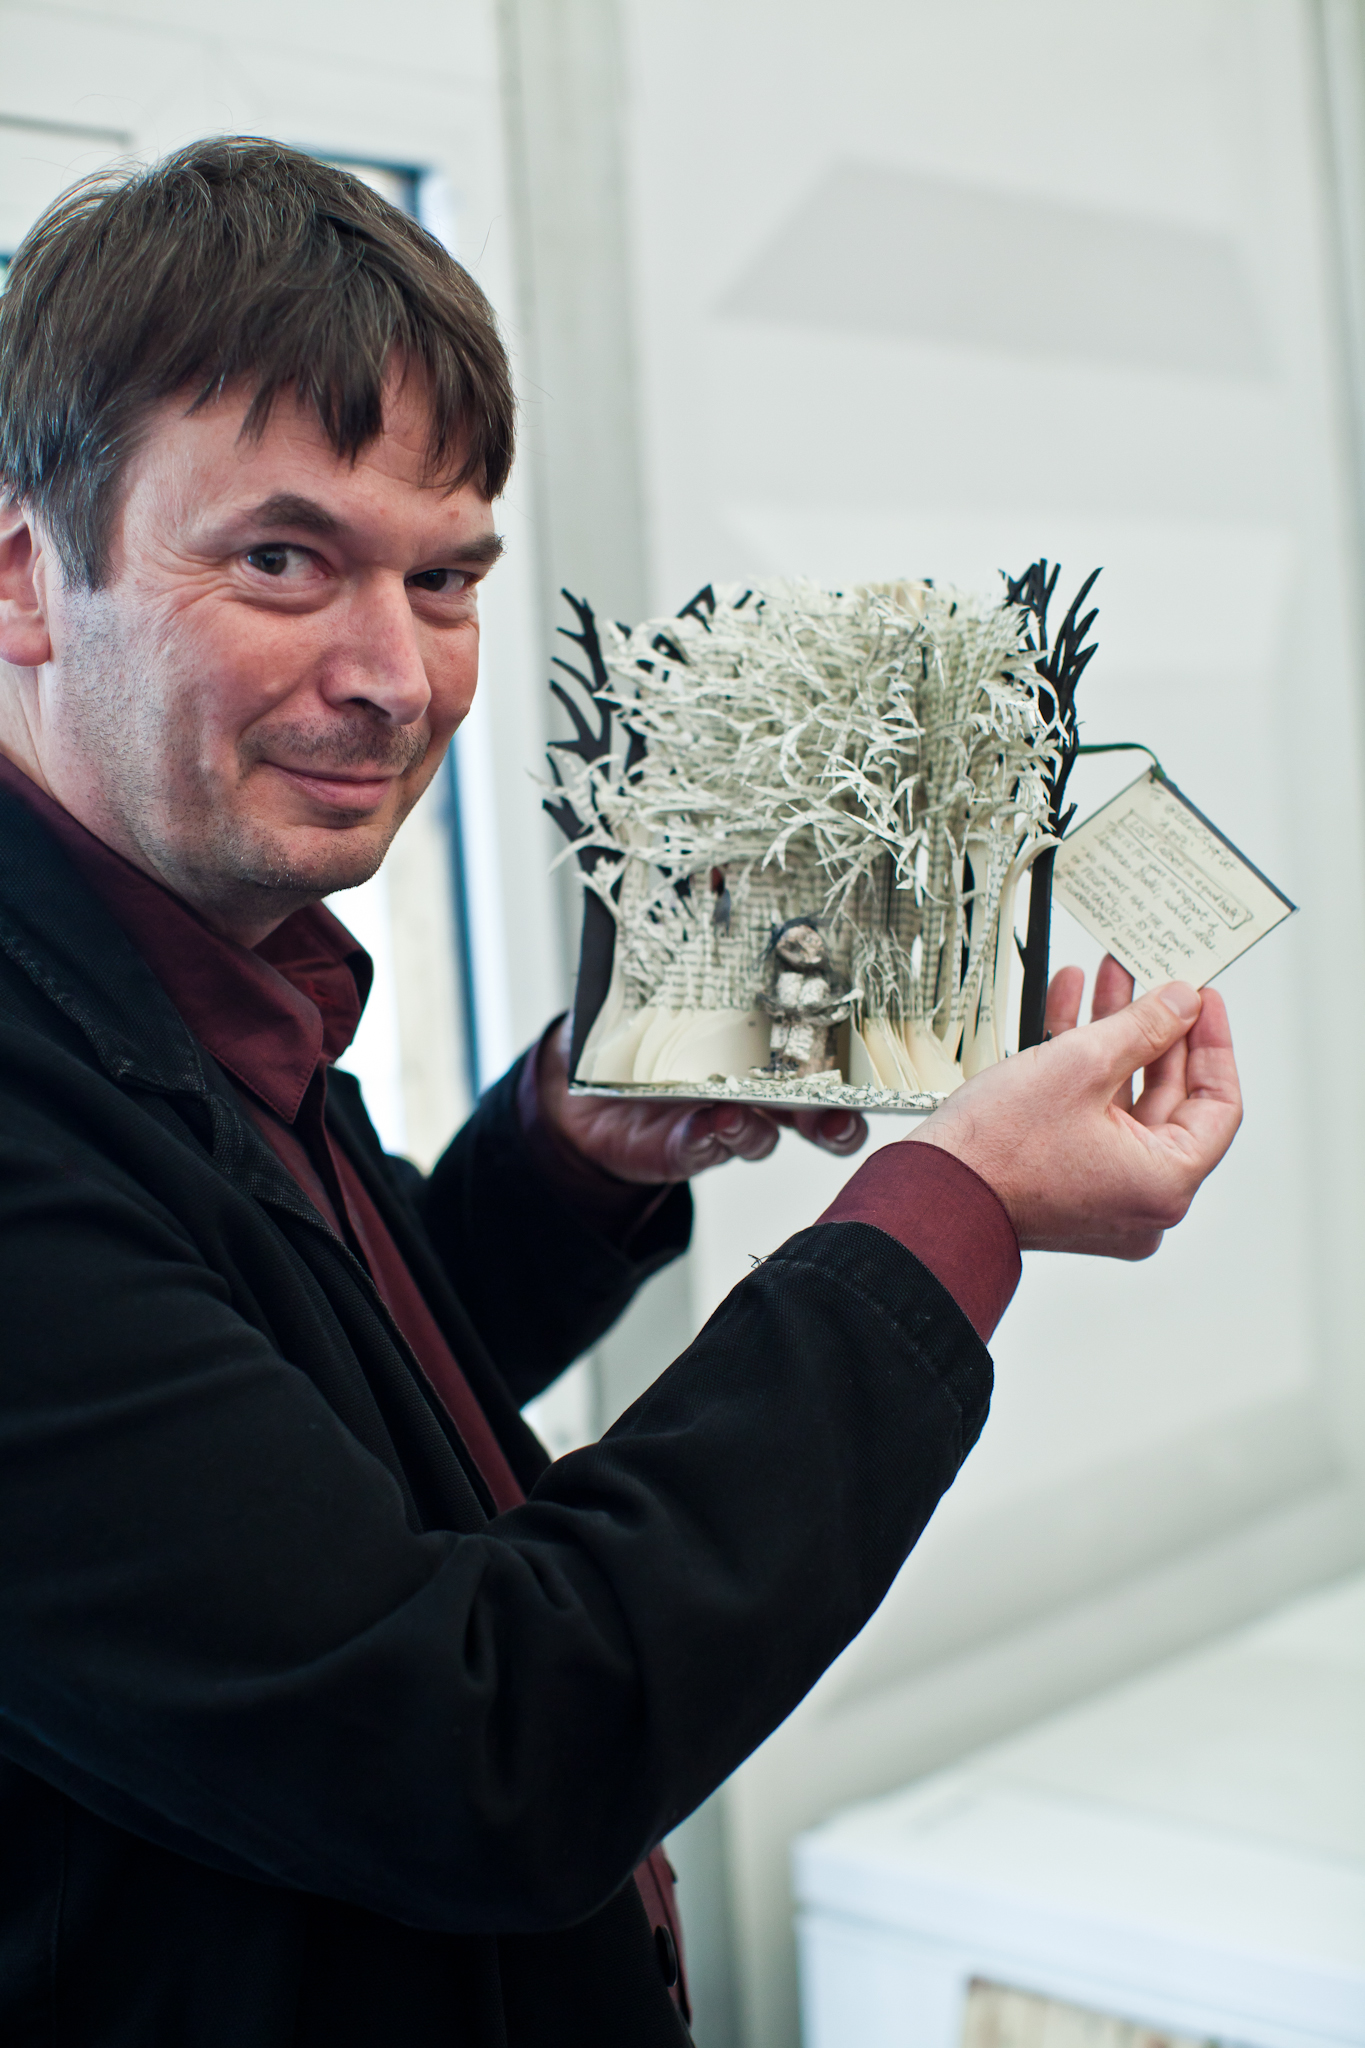 Book Sculpture with Ian Rankin (c) City of Literature Trust - Photographer Chris Scott